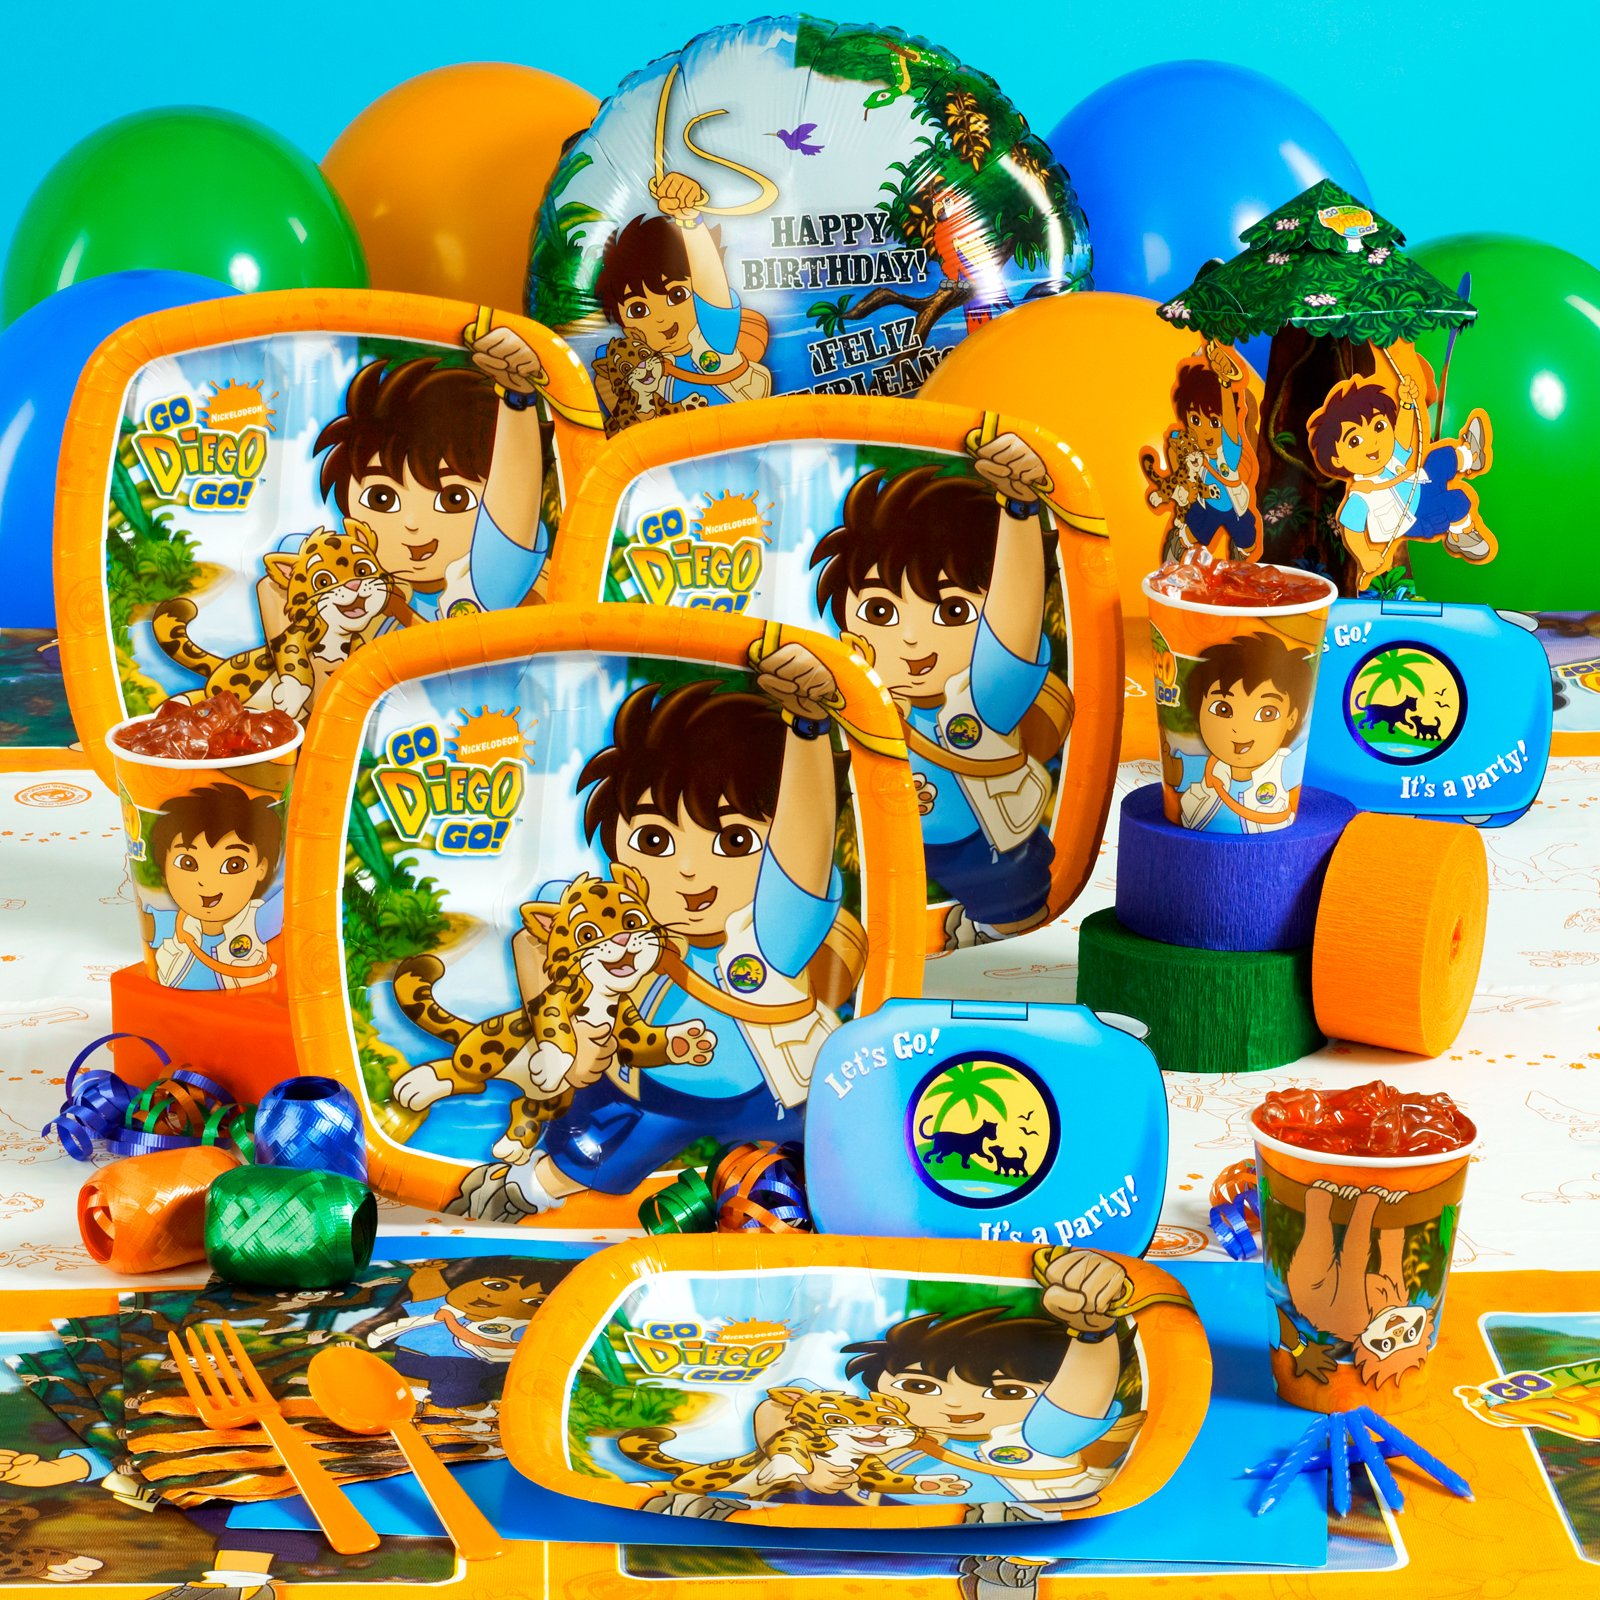 Centro de mesa decoracion infantil fiestas princesa - Decoracion fiesta infantil ...